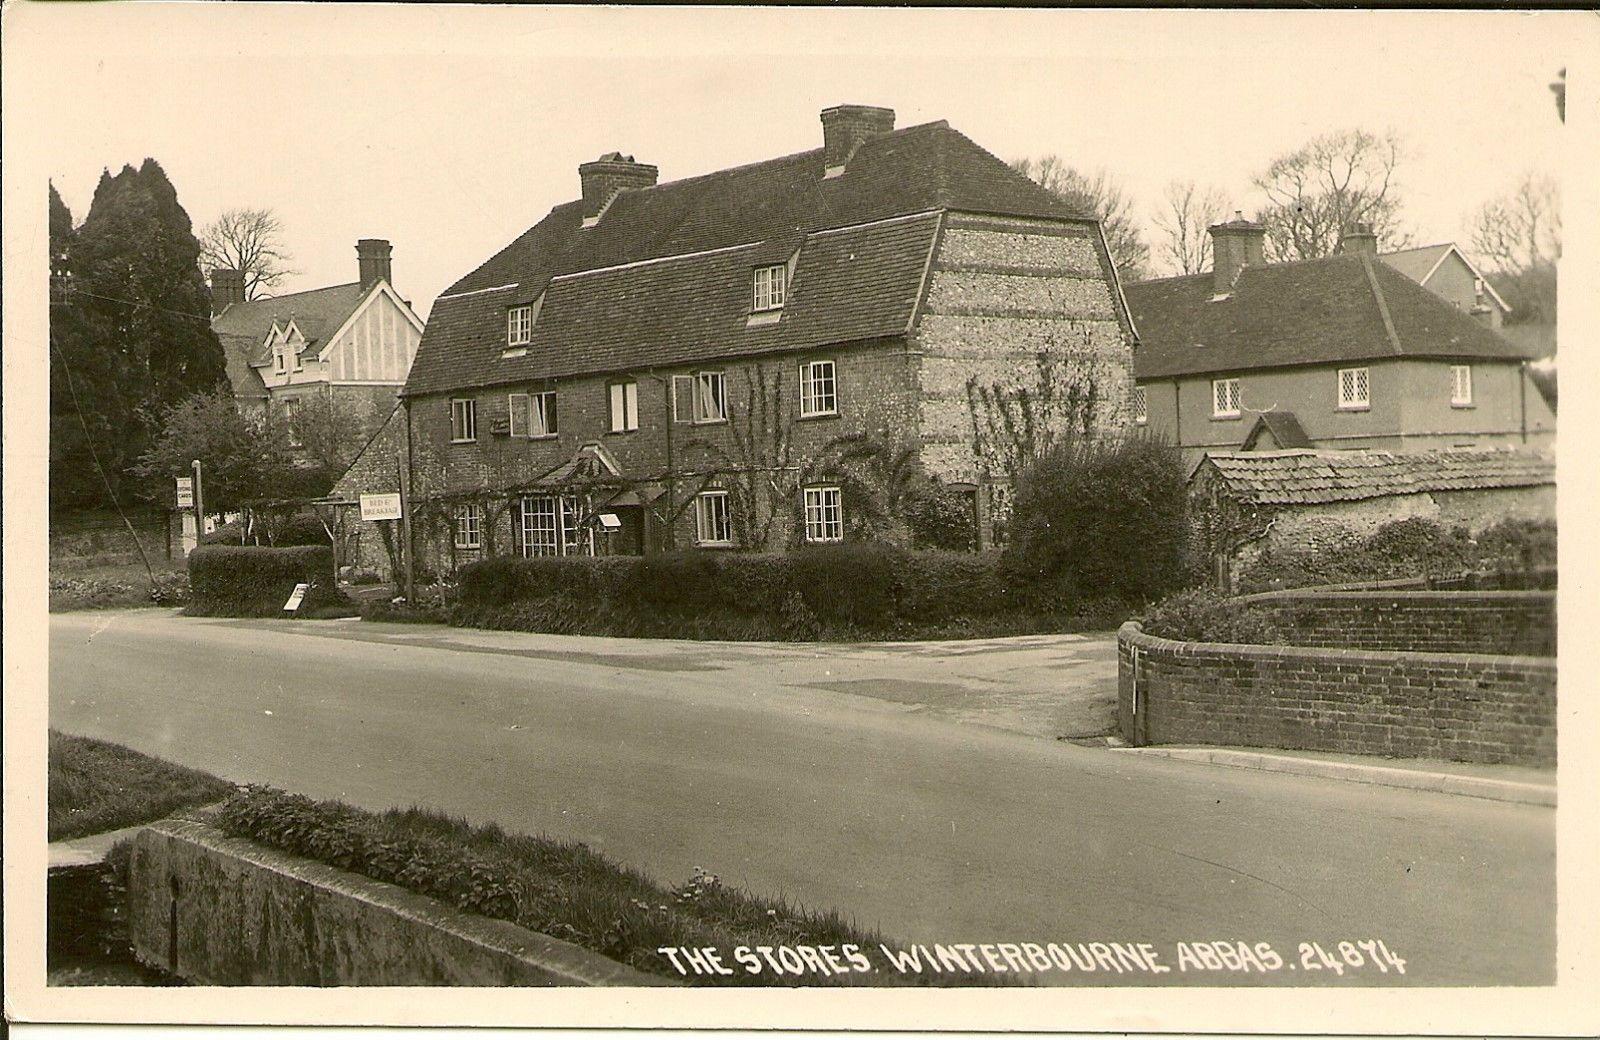 RP Postcard - THE STORES, WINTERBOURNE ABBAS Dorset • EUR 2,98 ...